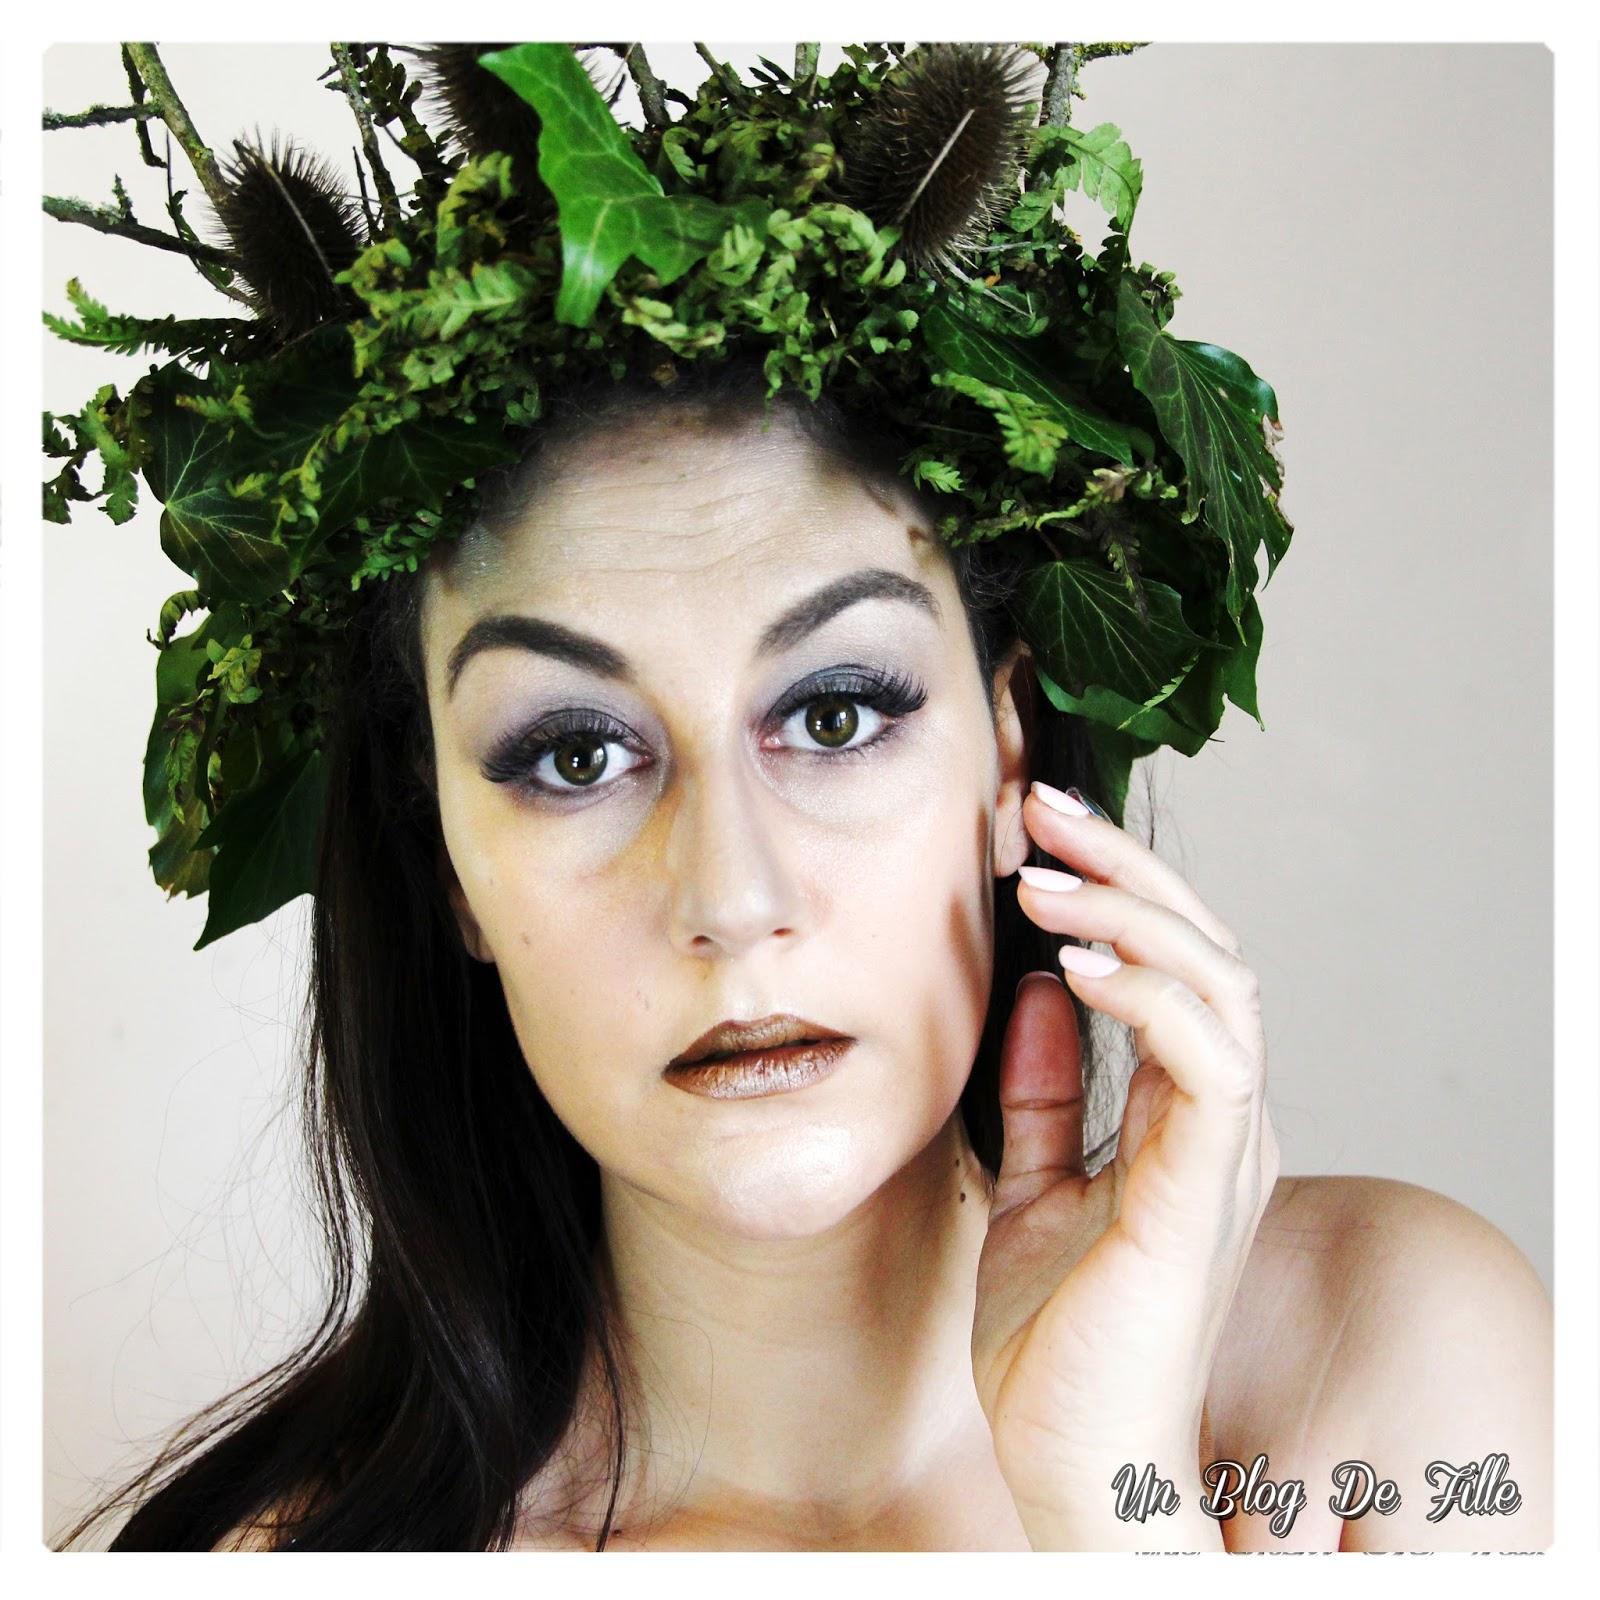 http://unblogdefille.blogspot.fr/2018/02/maquillage-artistique-terre-dame-nature.html